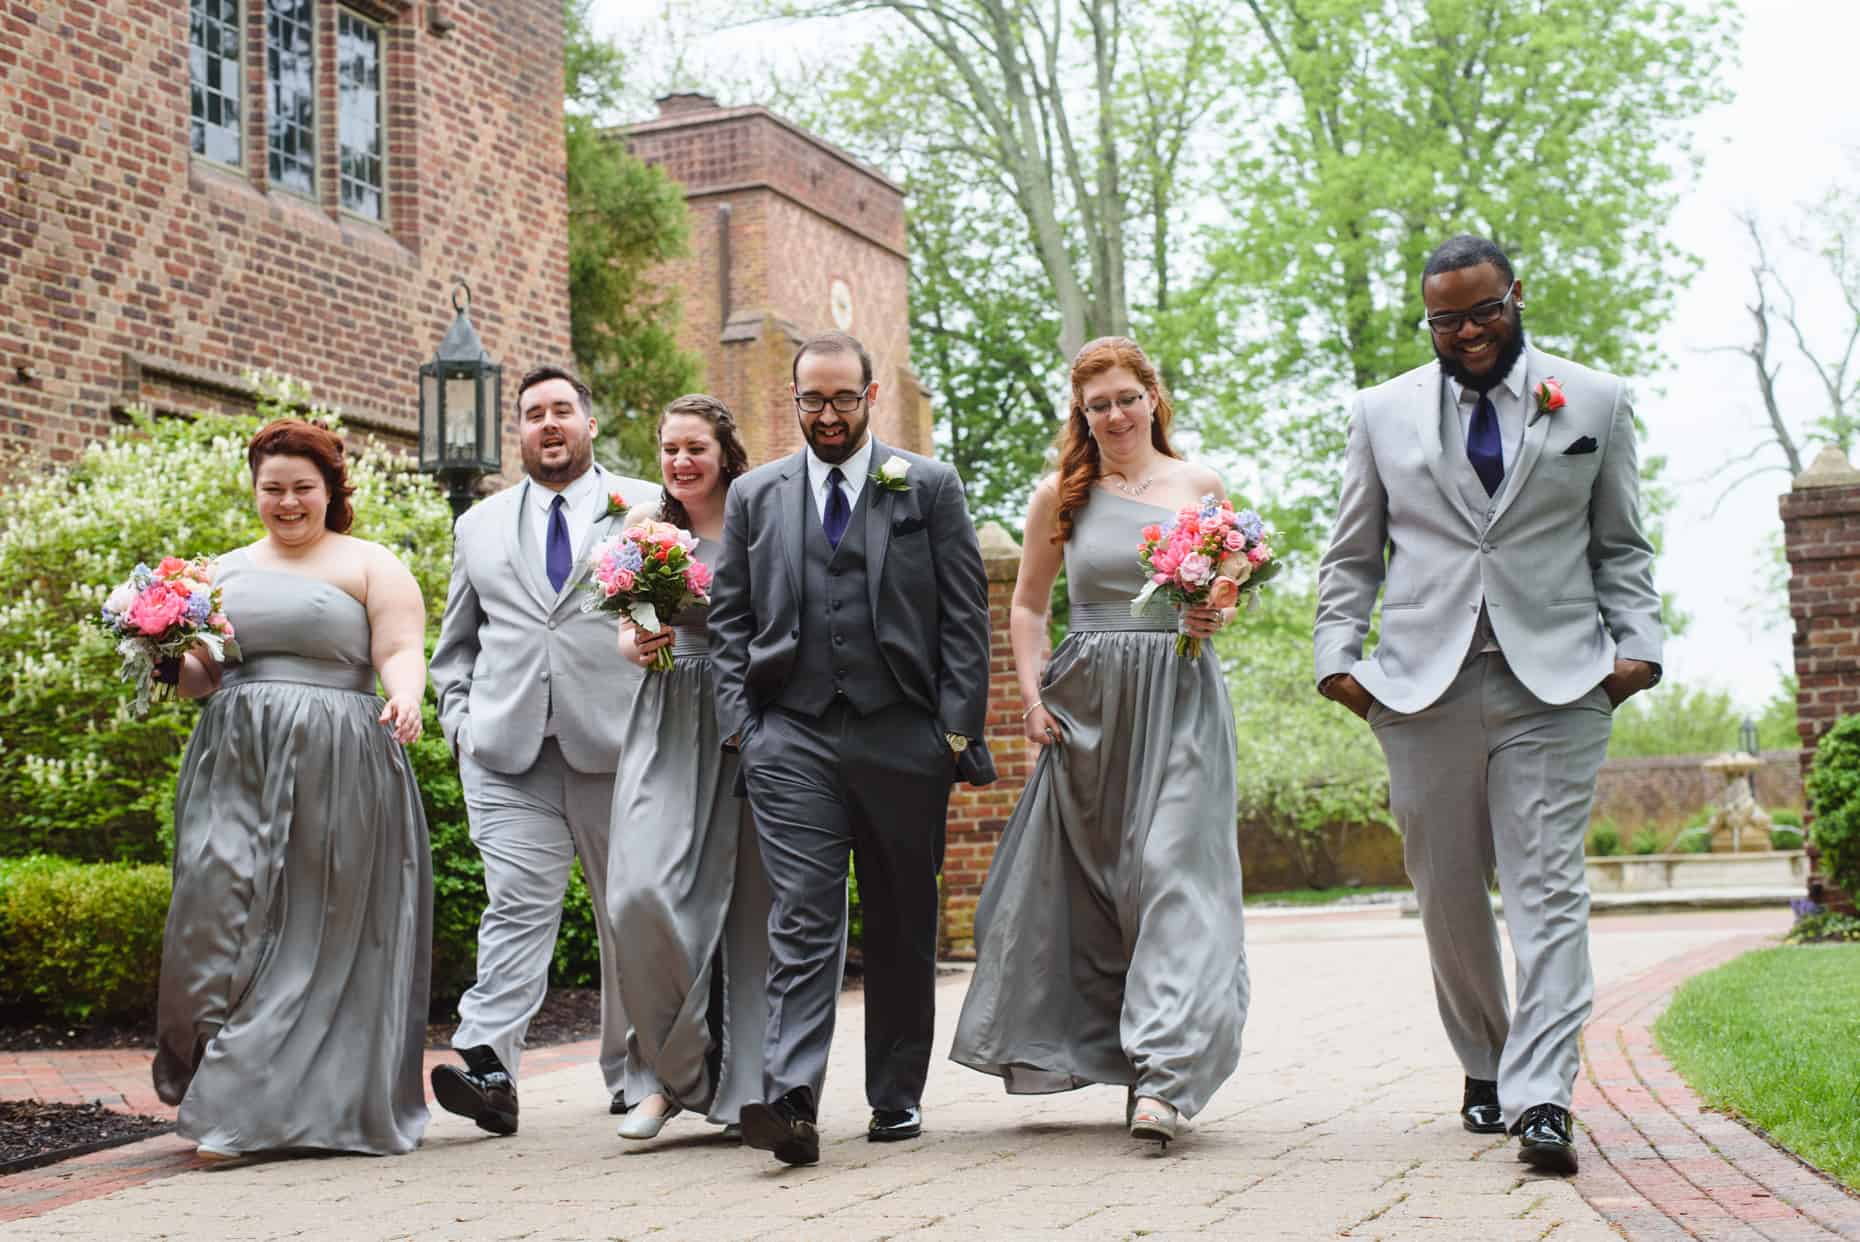 Bucks County Wedding Pictures